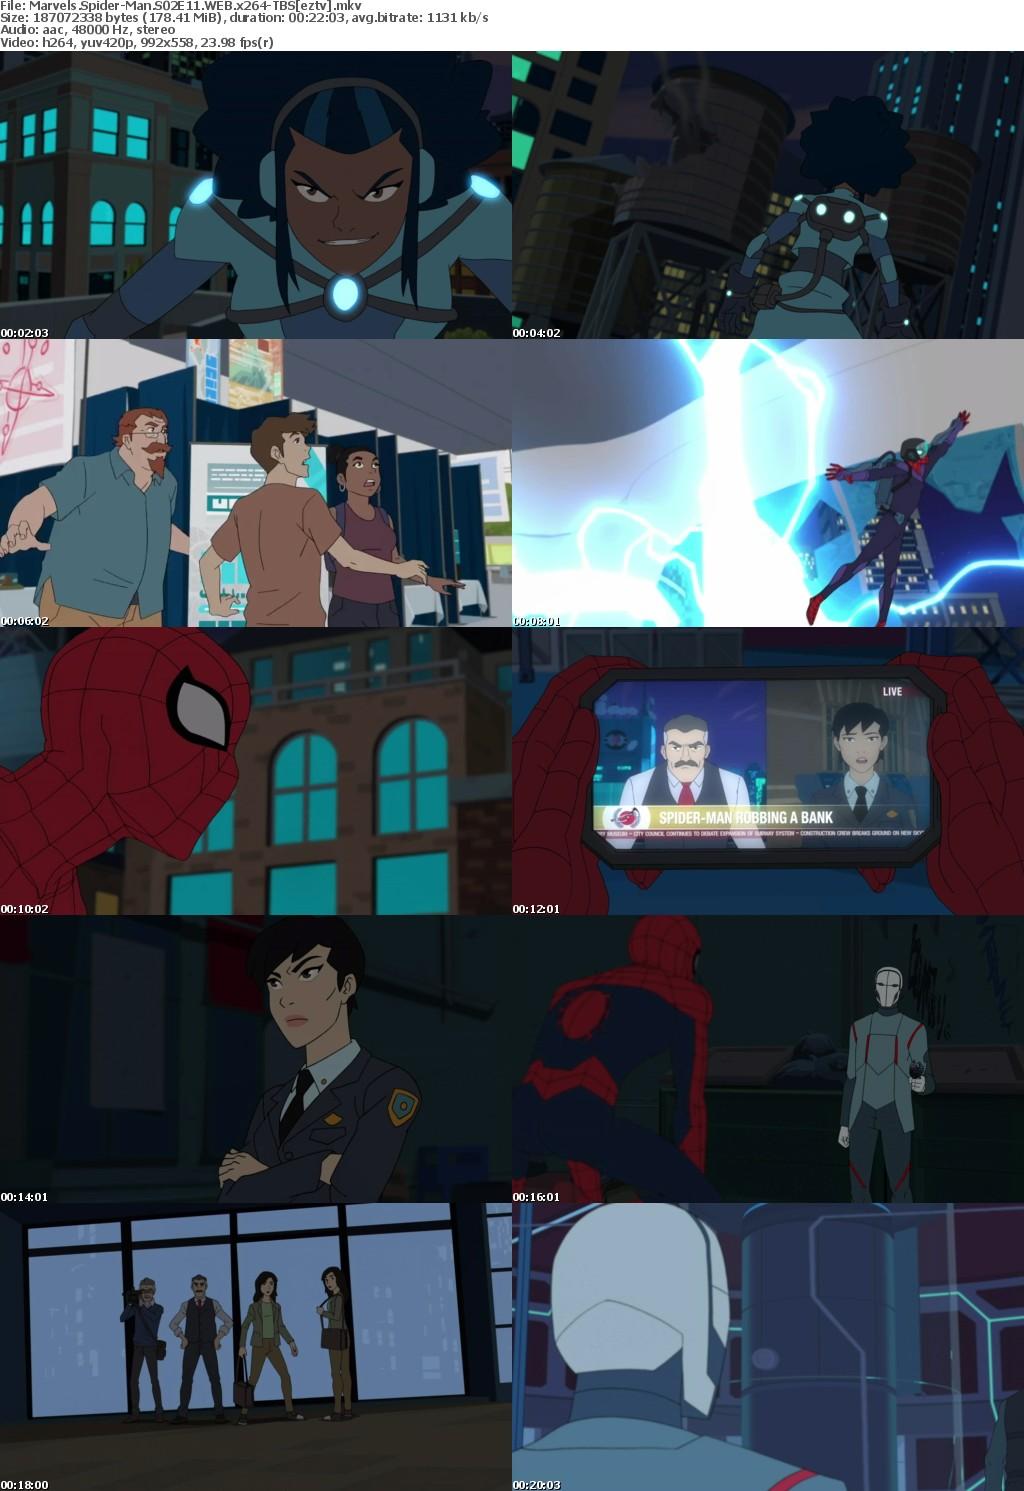 Marvels Spider-Man S02E11 WEB x264-TBS